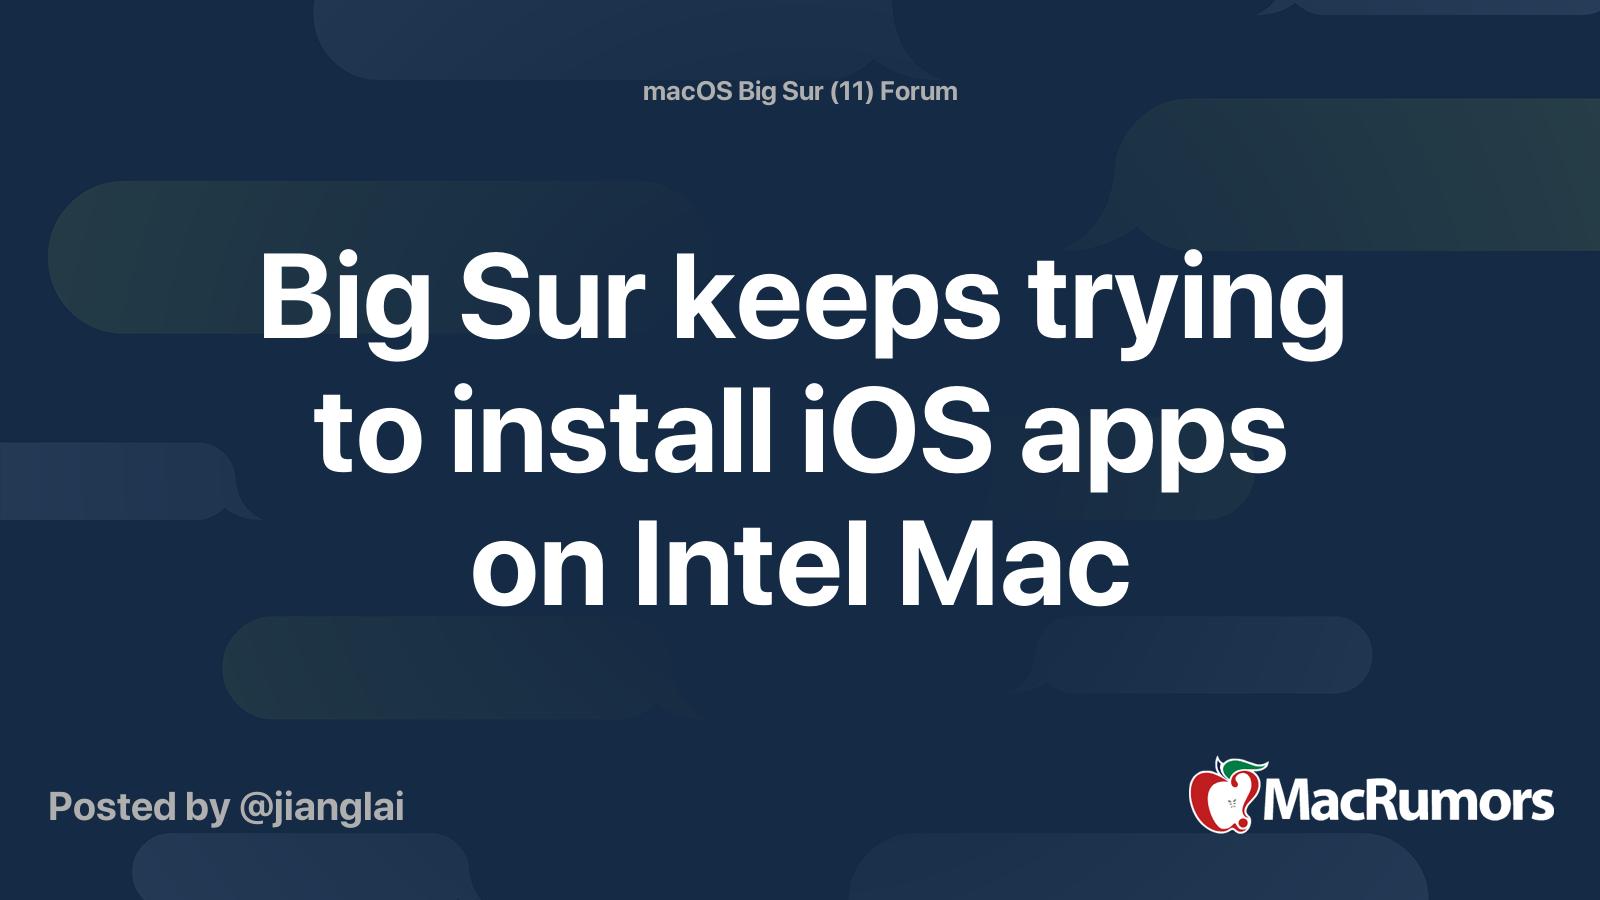 Big Sur keeps trying to install iOS apps on Intel Mac - Mac Rumors